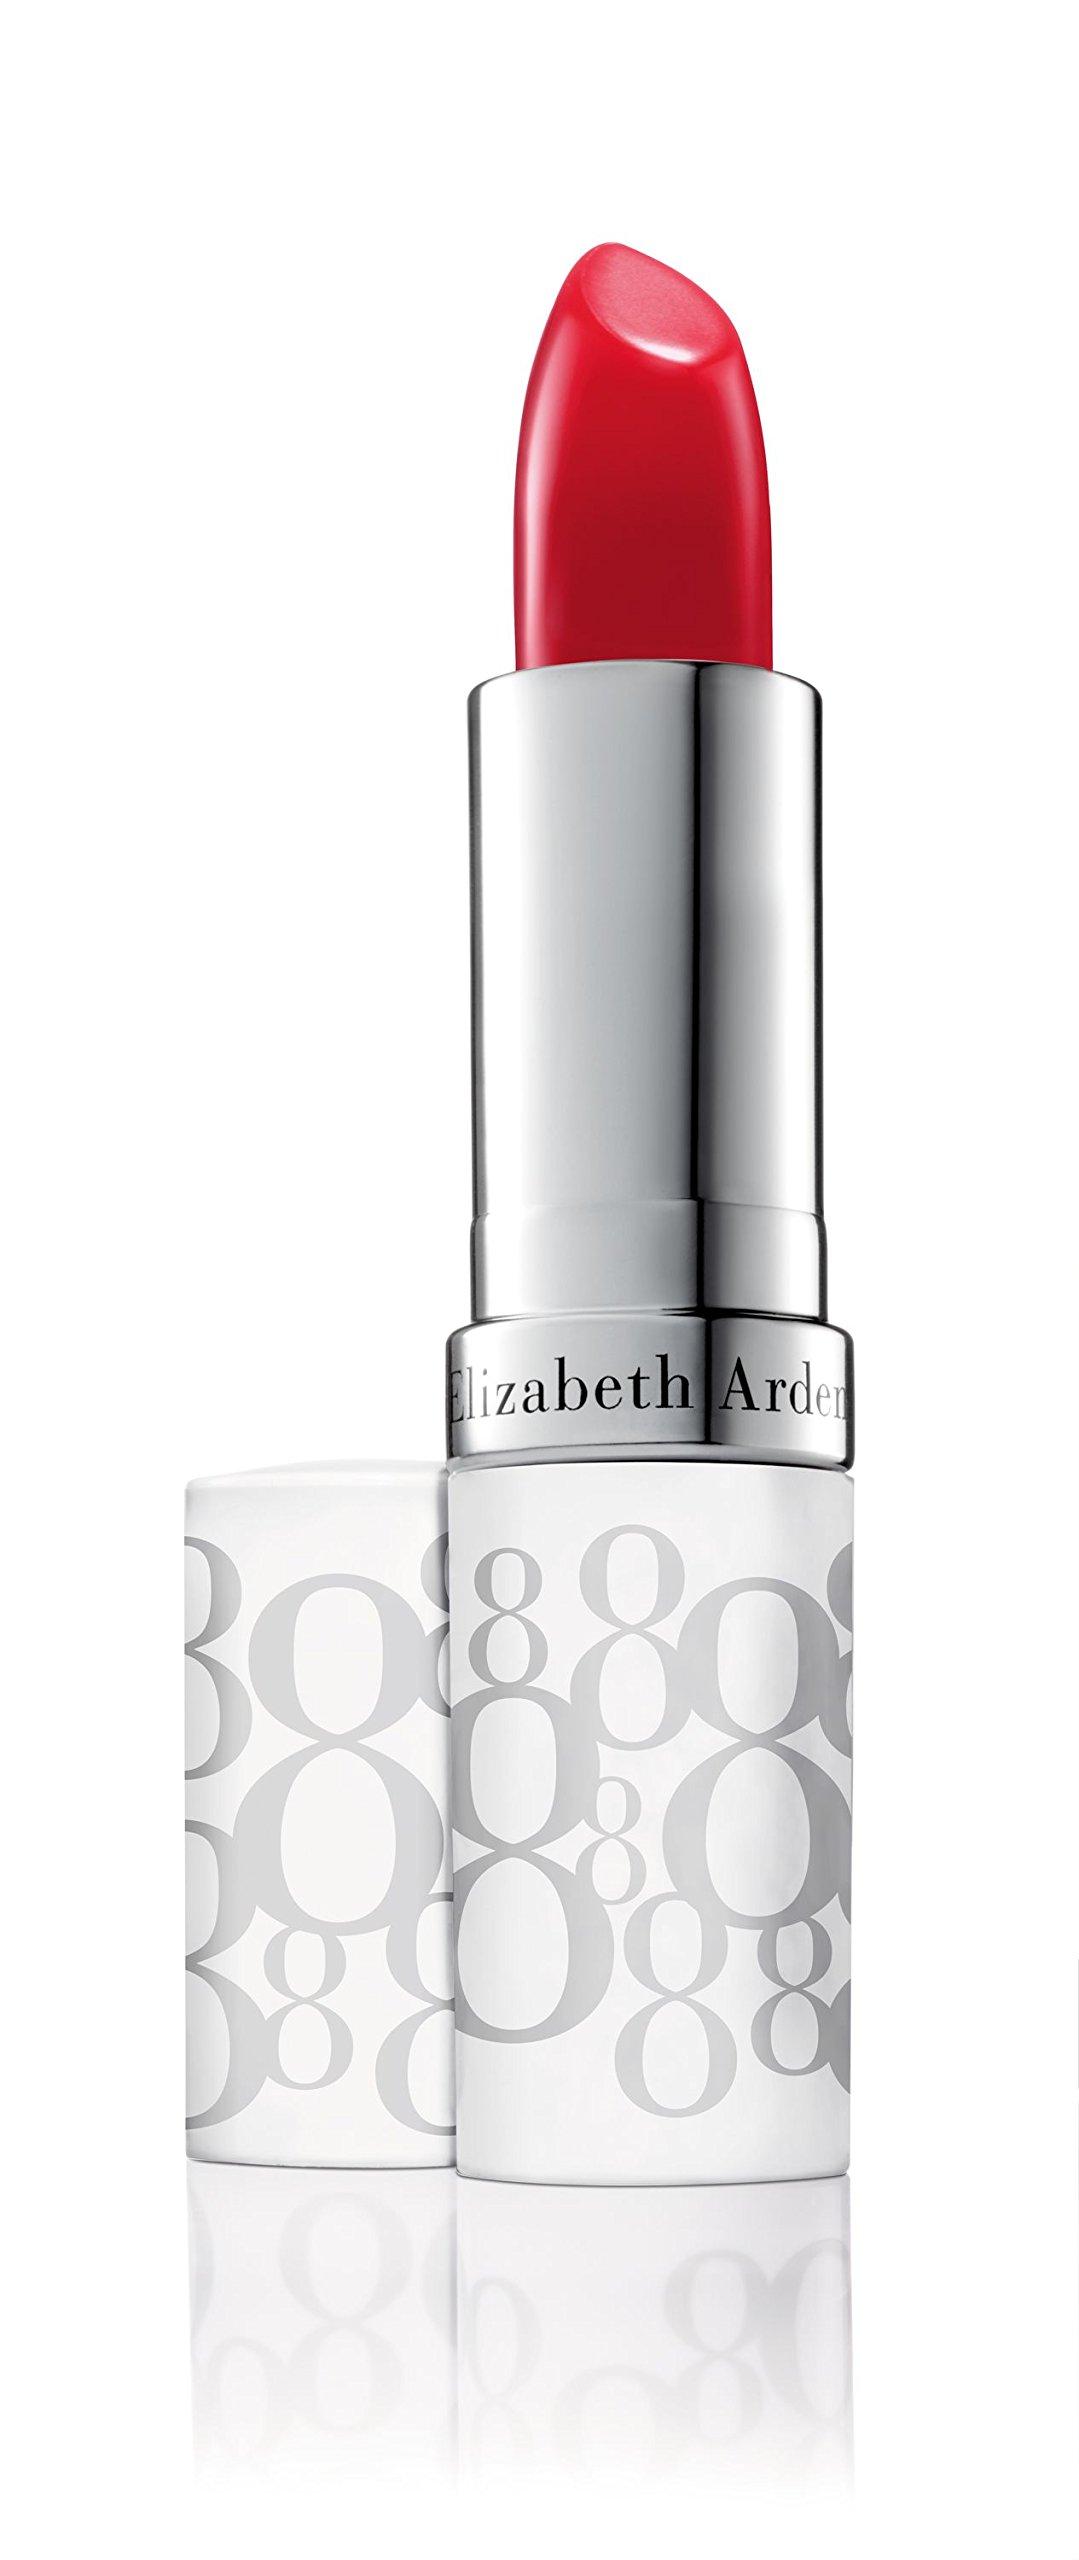 Elizabeth Arden 8 Hour Lip Protectant Stick SPF 15, Berry by Elizabeth Arden